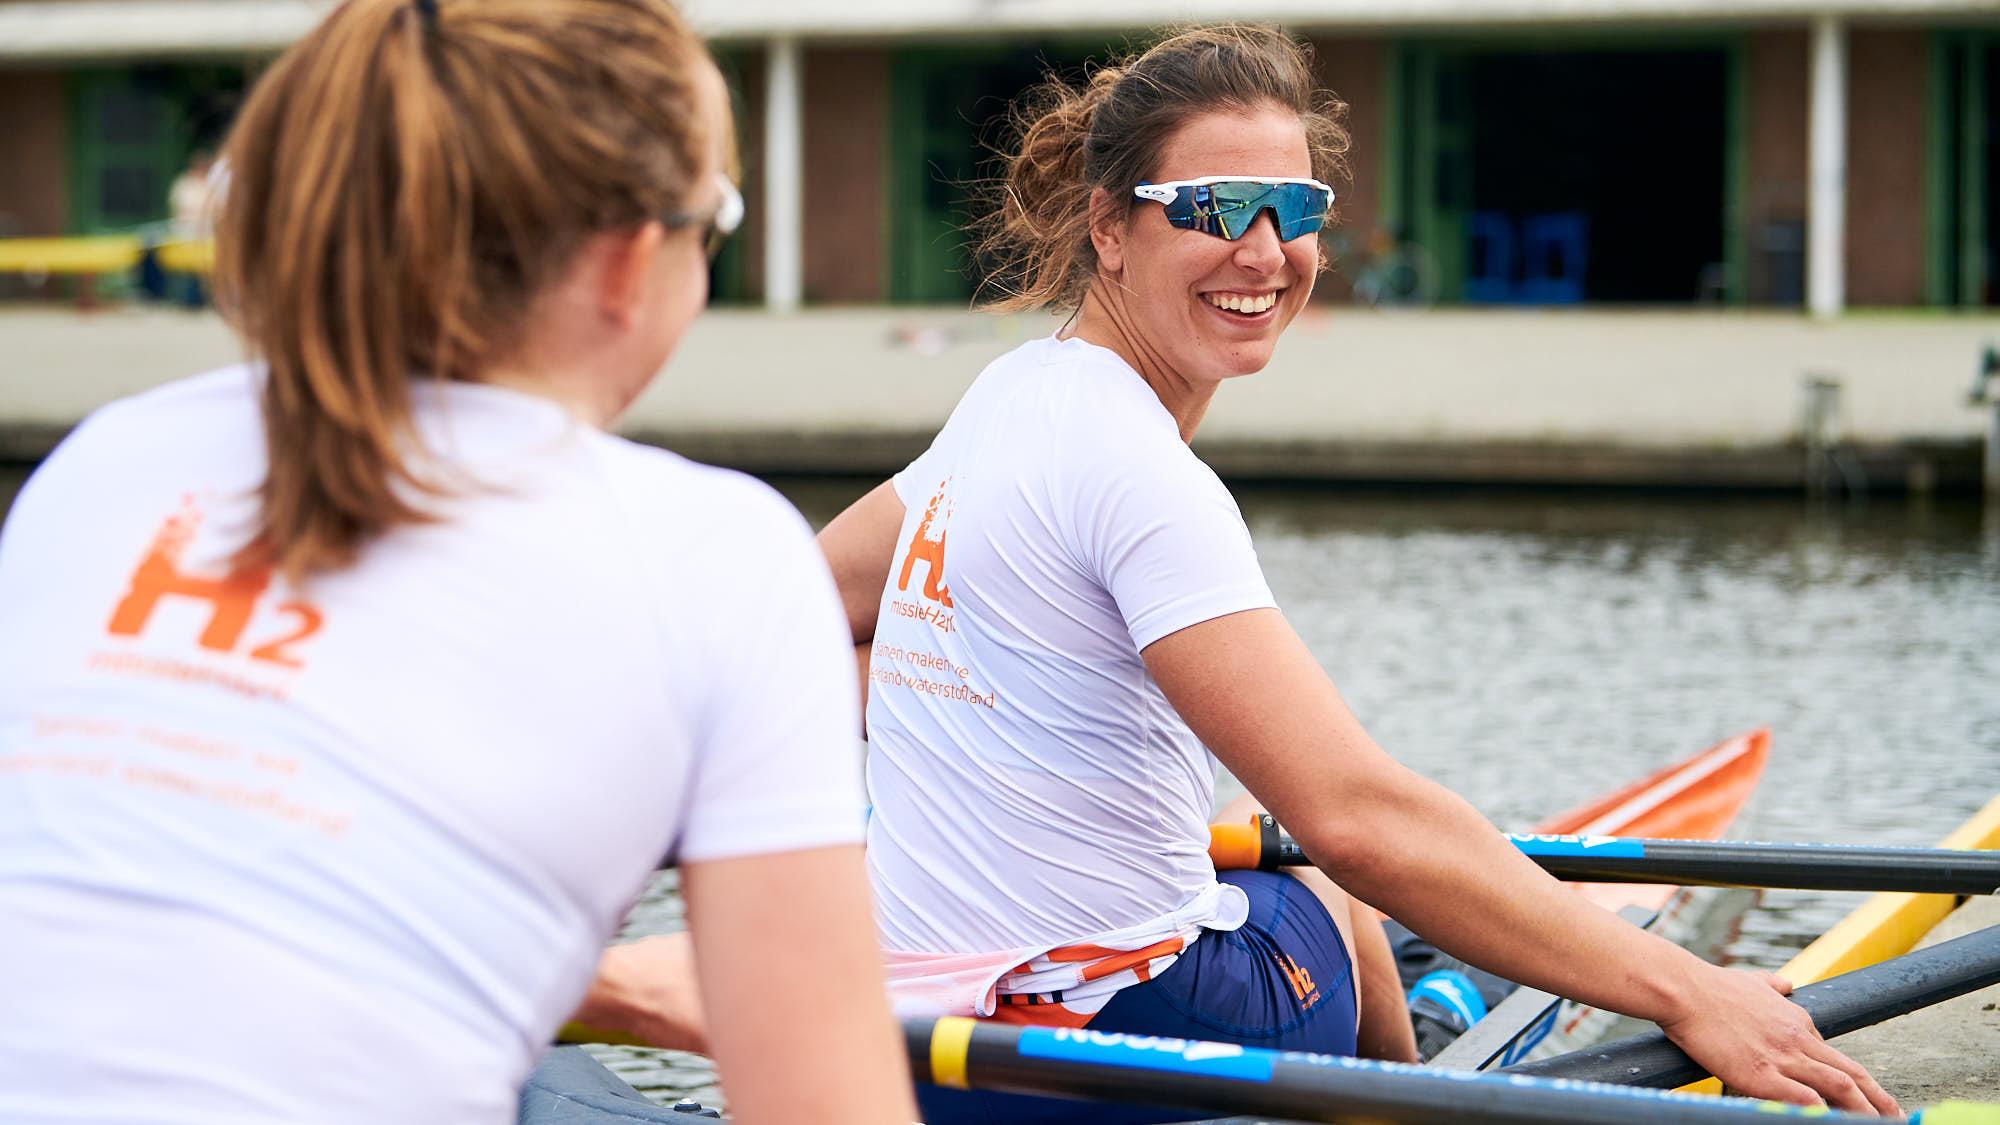 Ilse Paulis and Marieke Keijser lifestyle shot in rowing boat